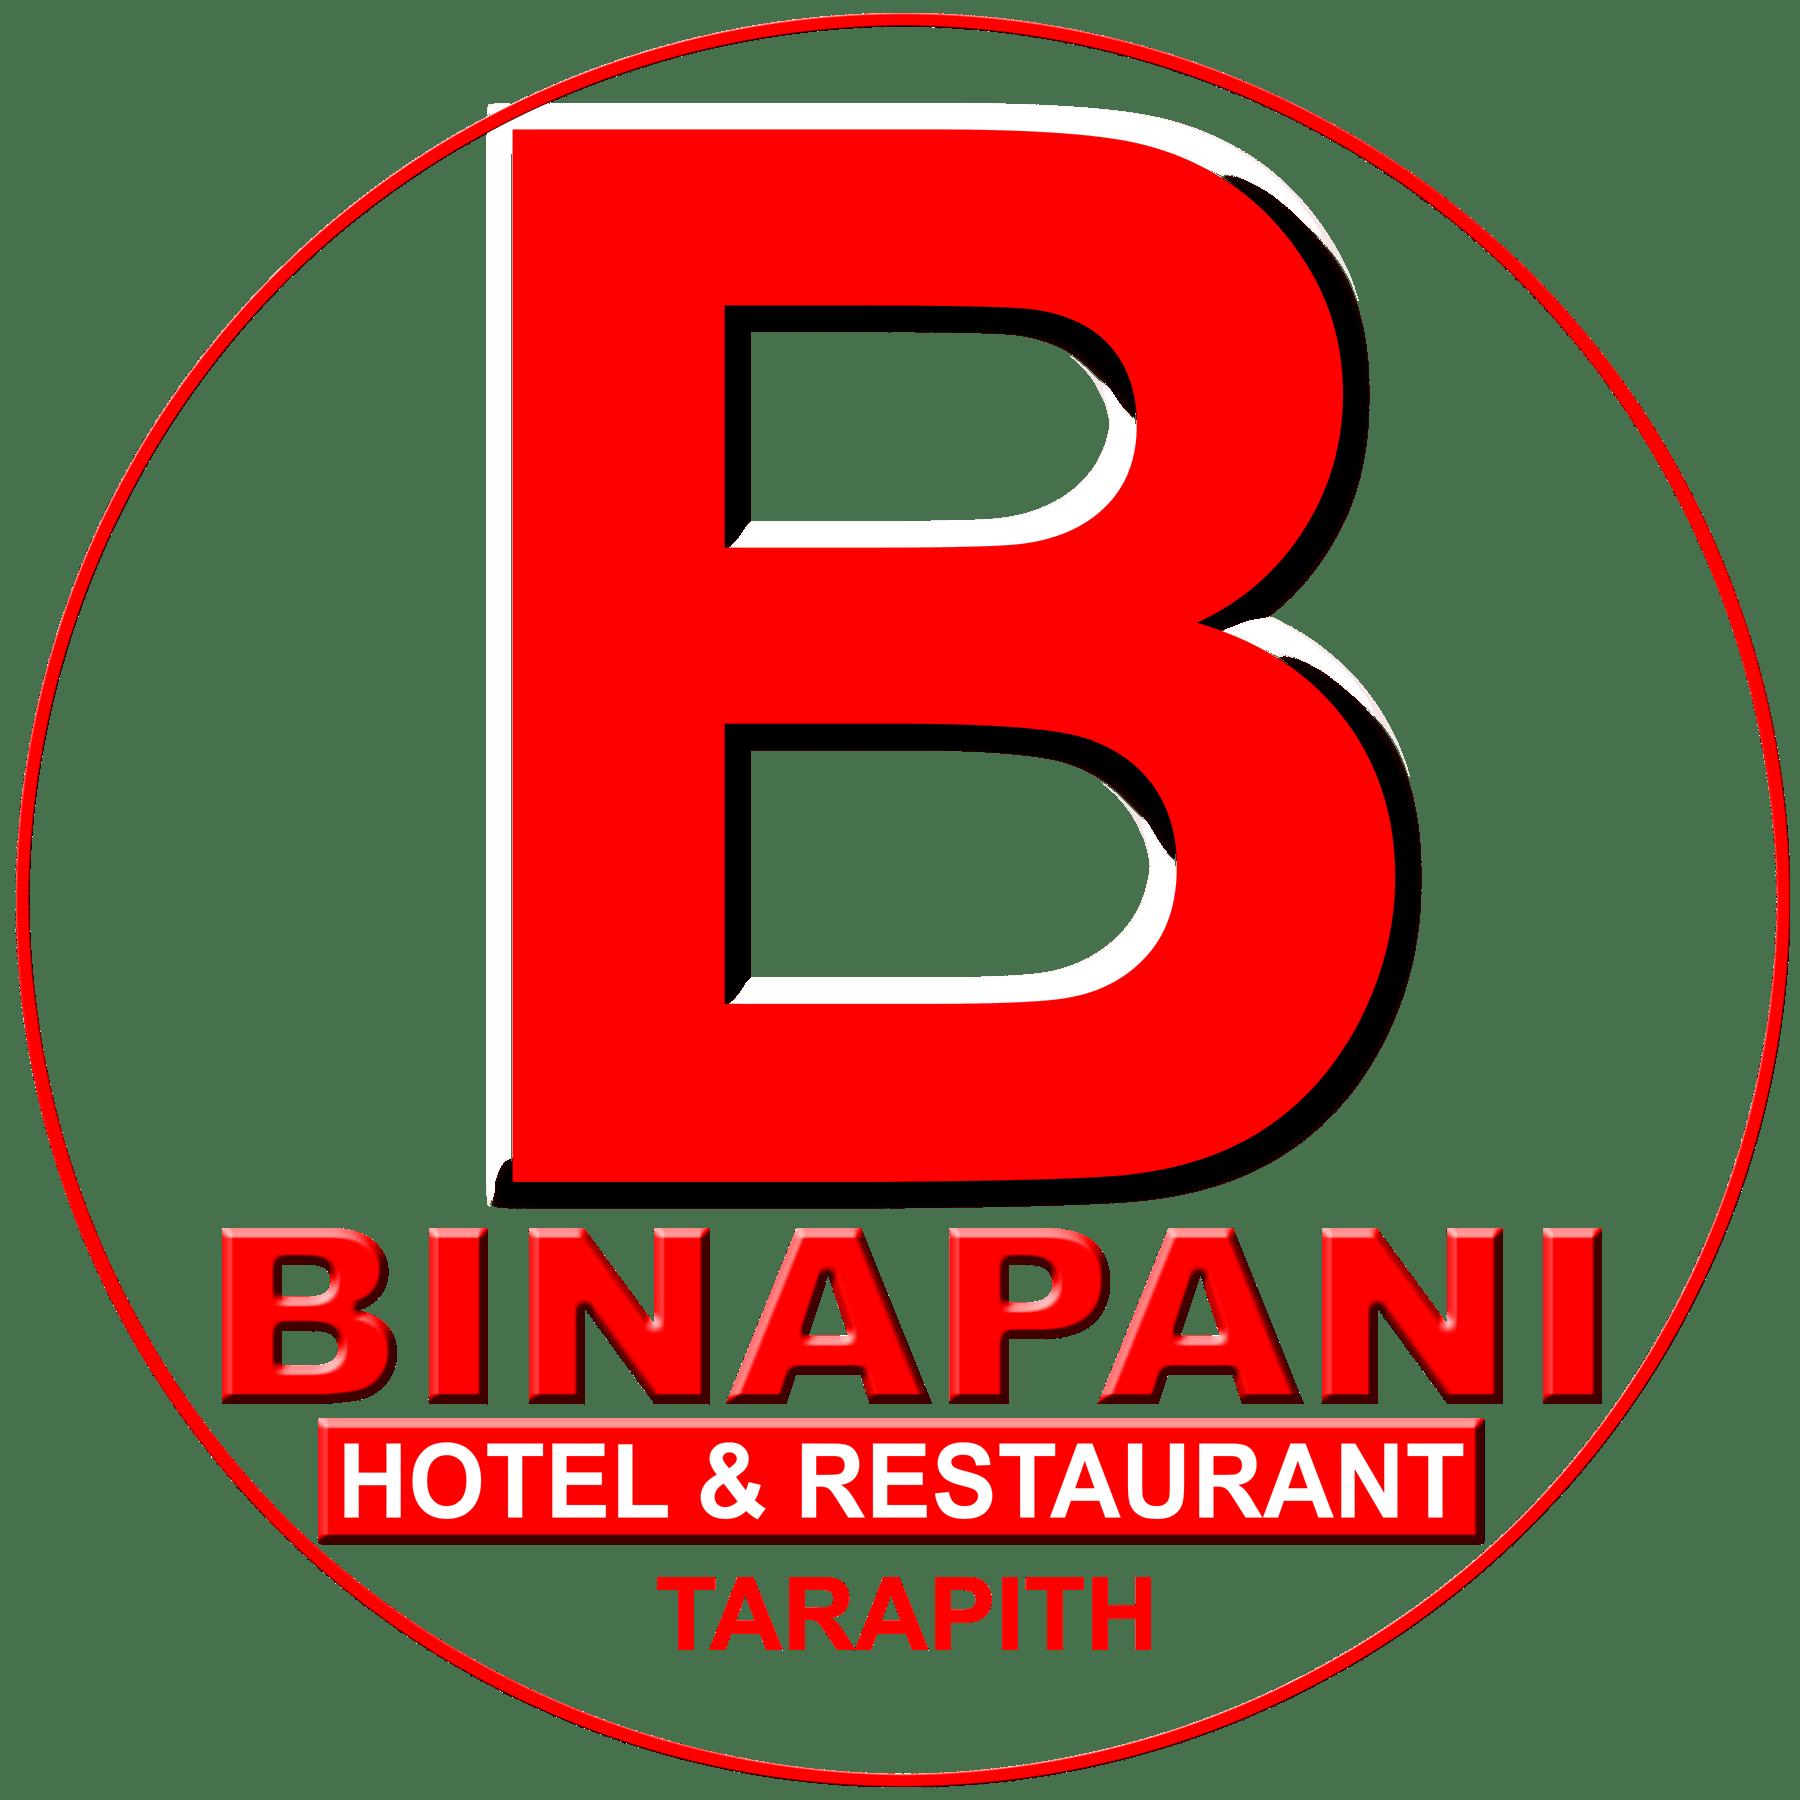 Binapani Hotel & Restaurant